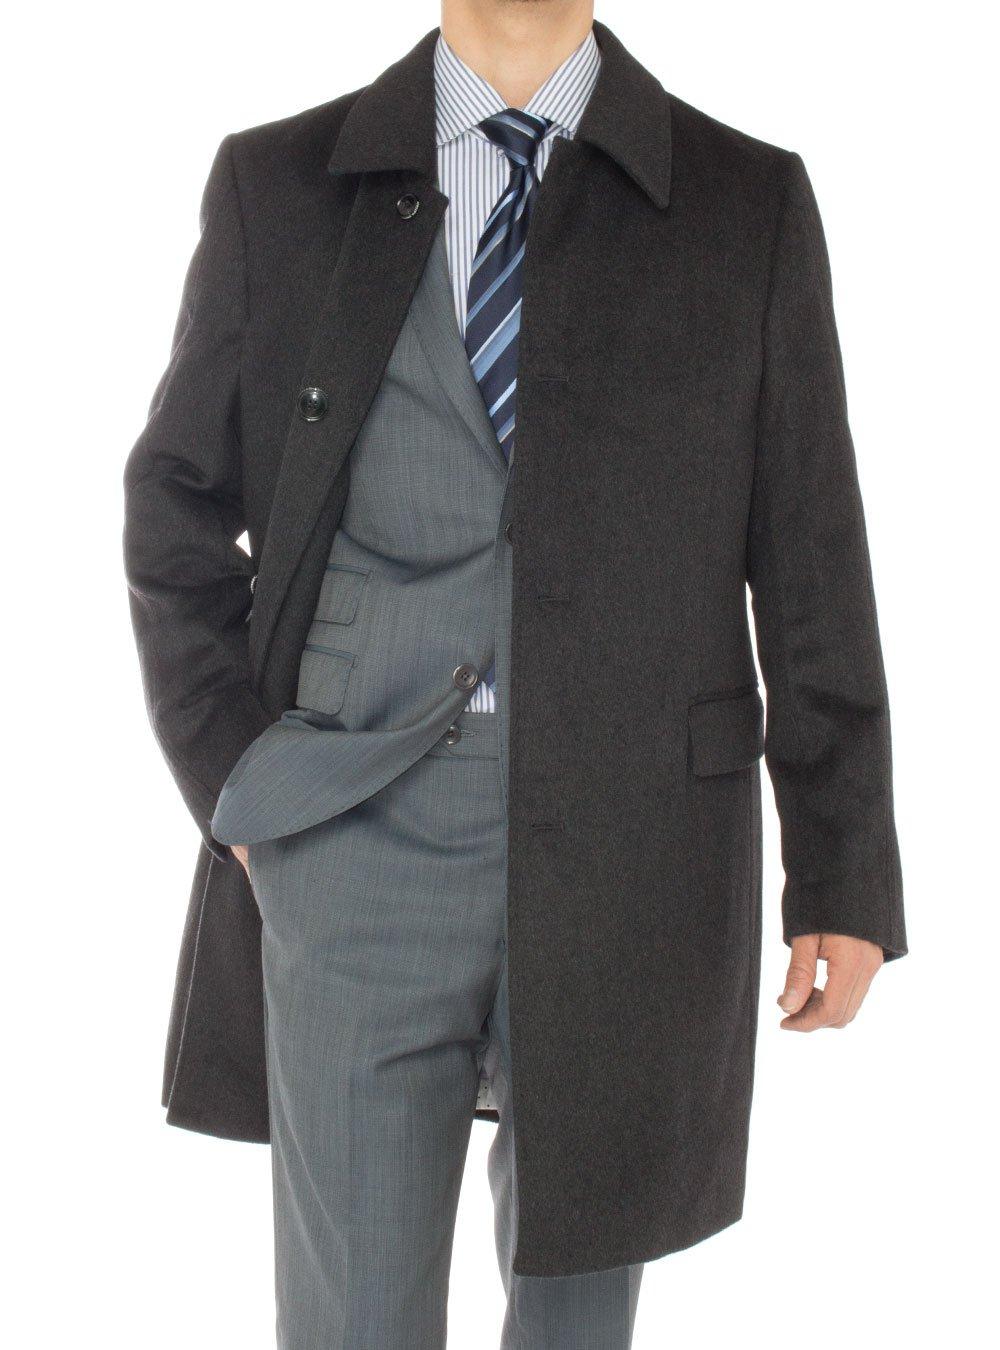 Luciano Natazzi Men's Cashmere Topcoat Classic Knee Length Trench Coat Overcoat (40 US - 50 EU, Charcoal Gray)